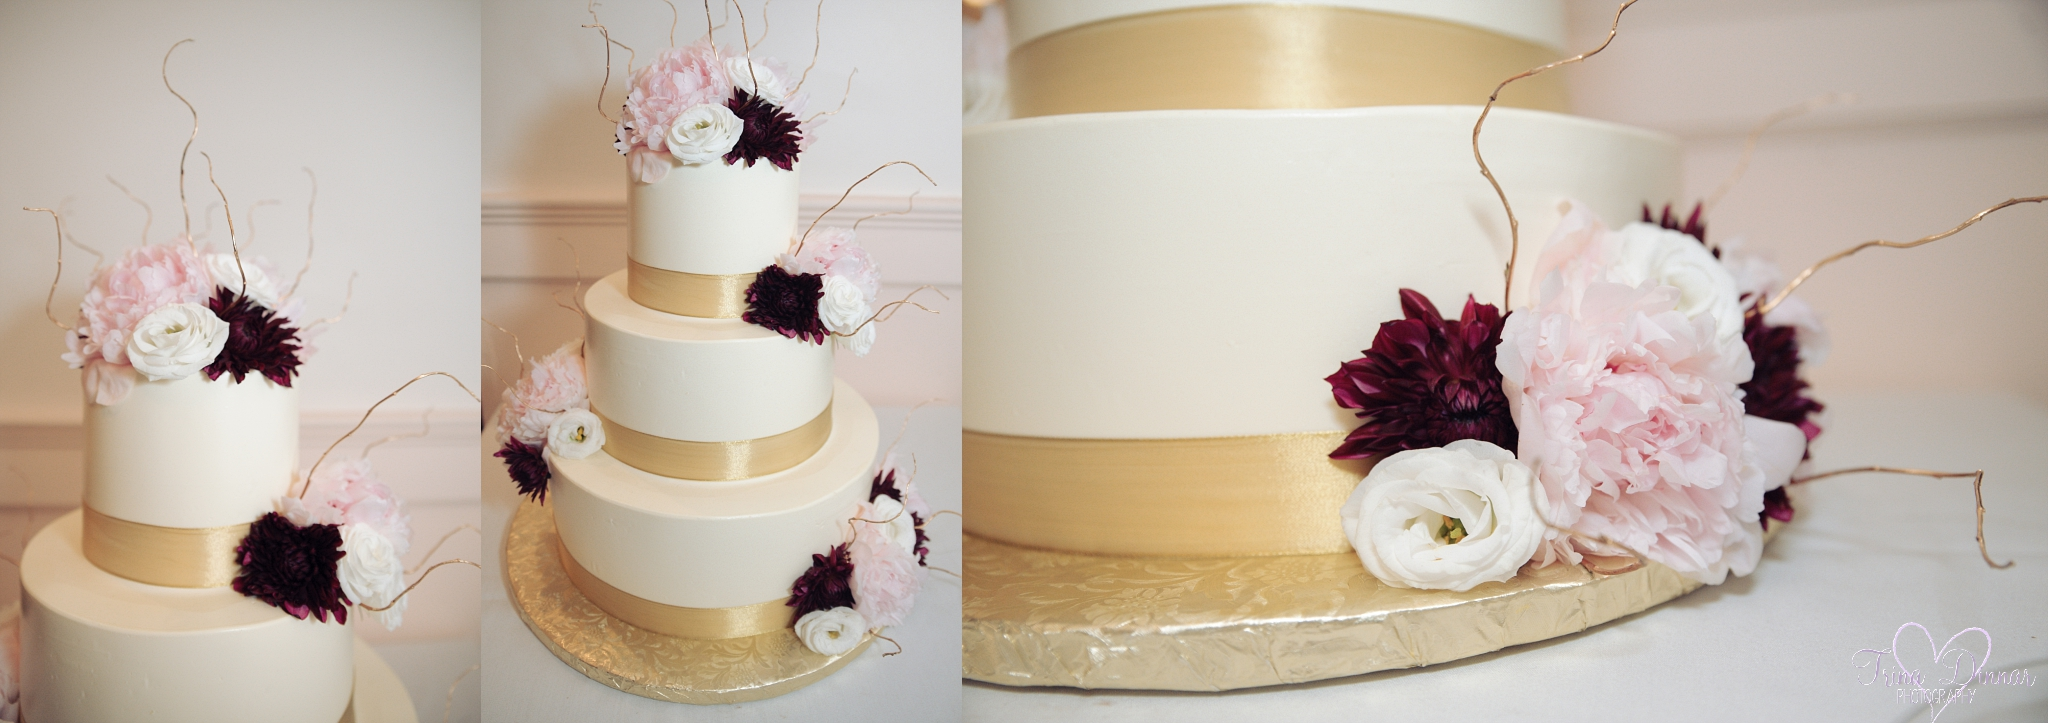 Jacques' Fine European Pastries New Hampshire Wedding Cake